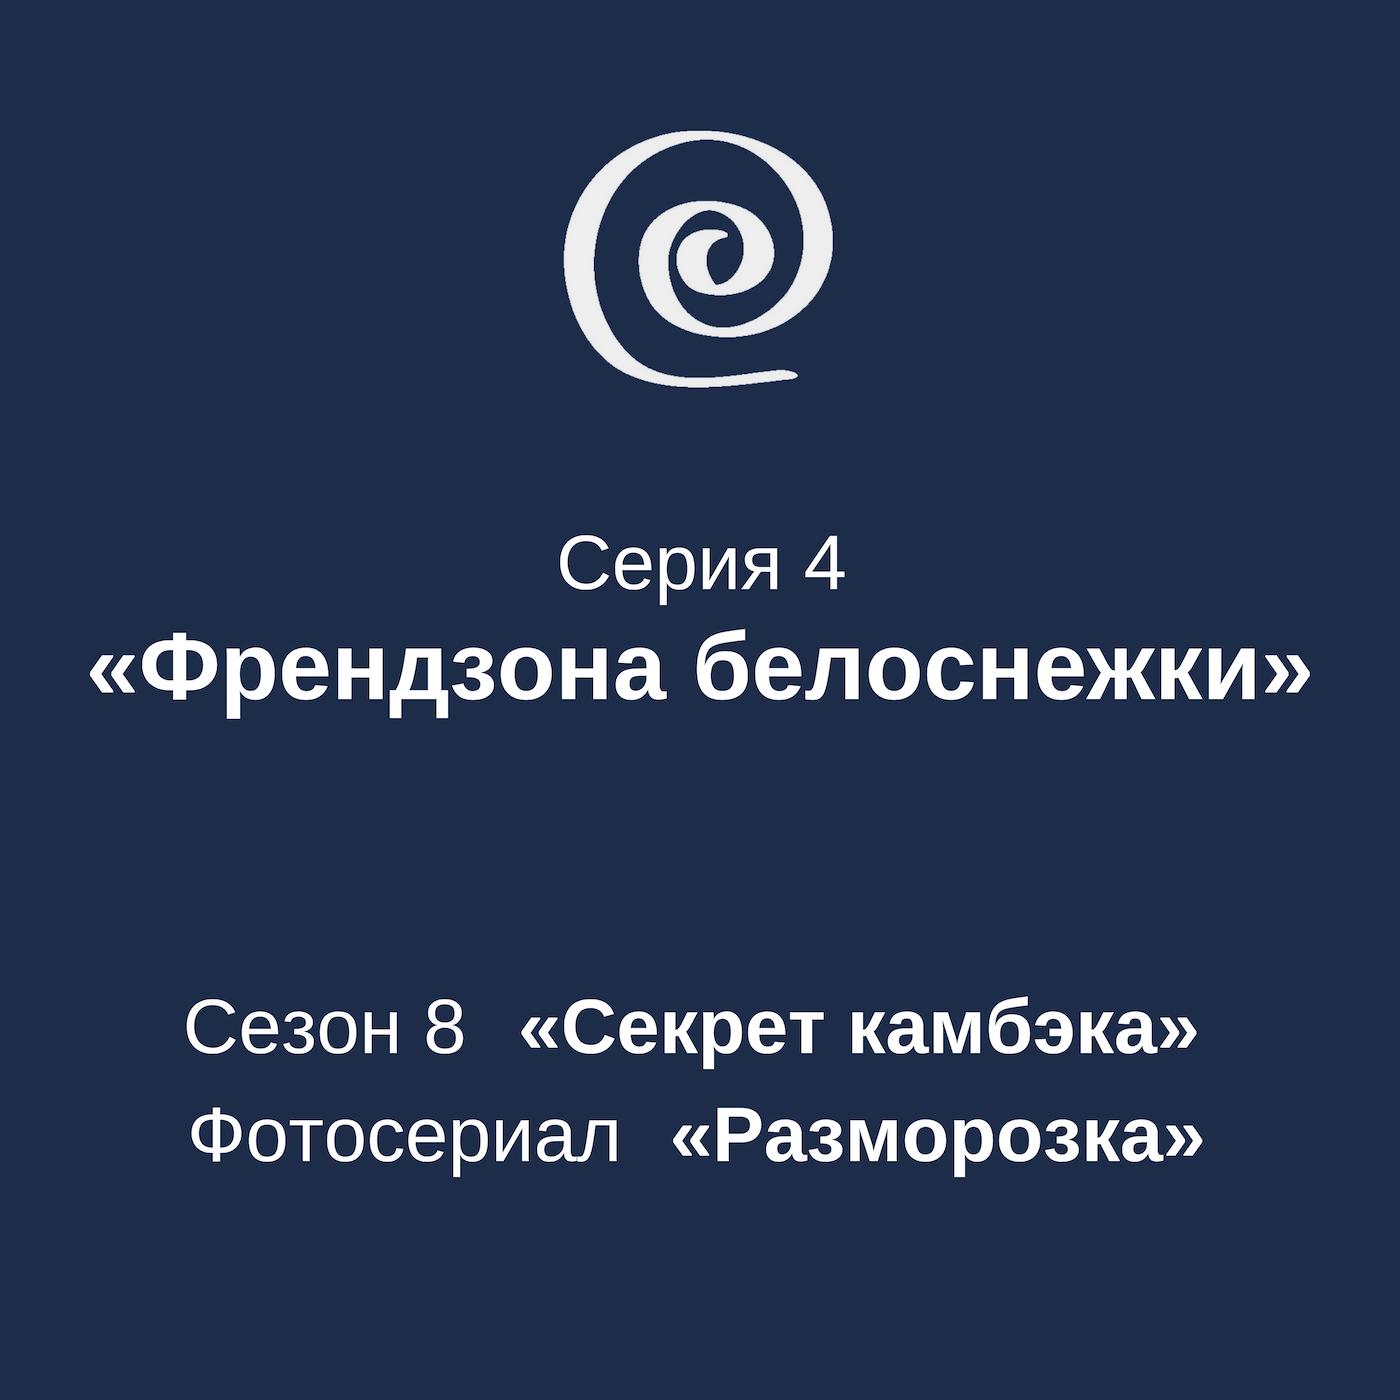 Фотосериал Разморозка. Сезон 8. Серия 4. Френдзона белоснежки. Обложка